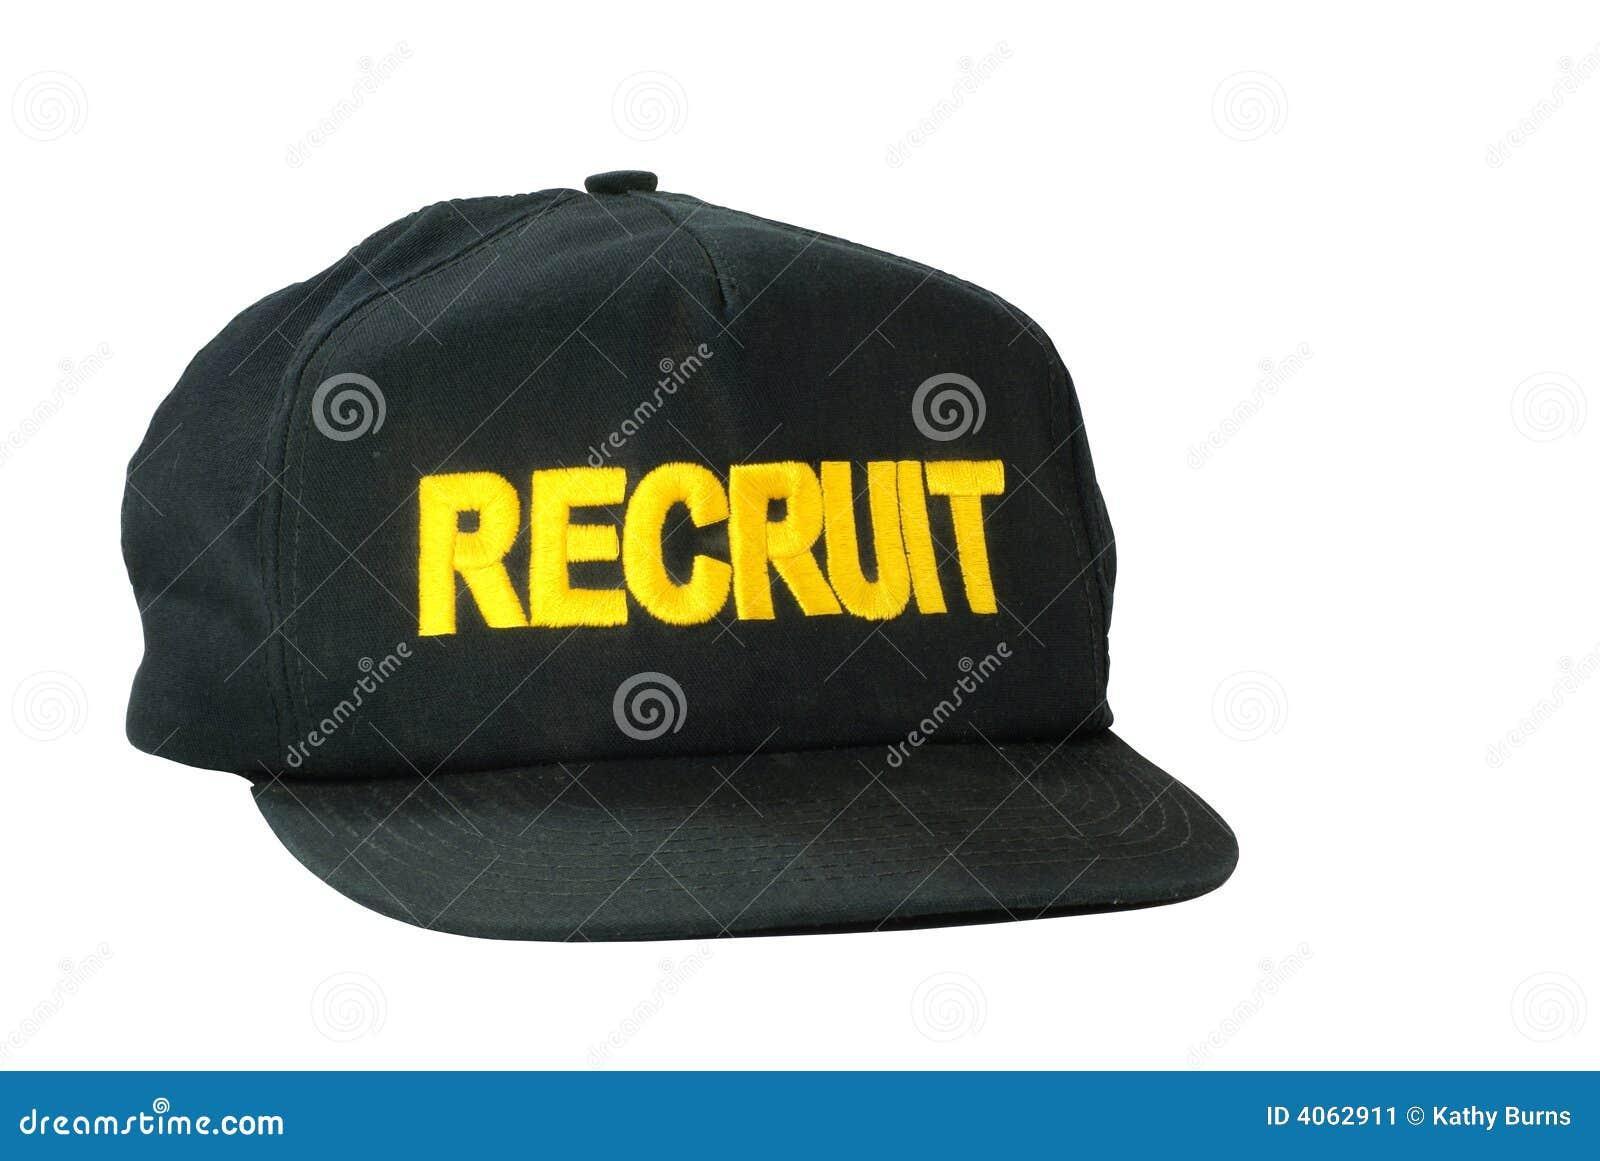 Recruta Ballcap